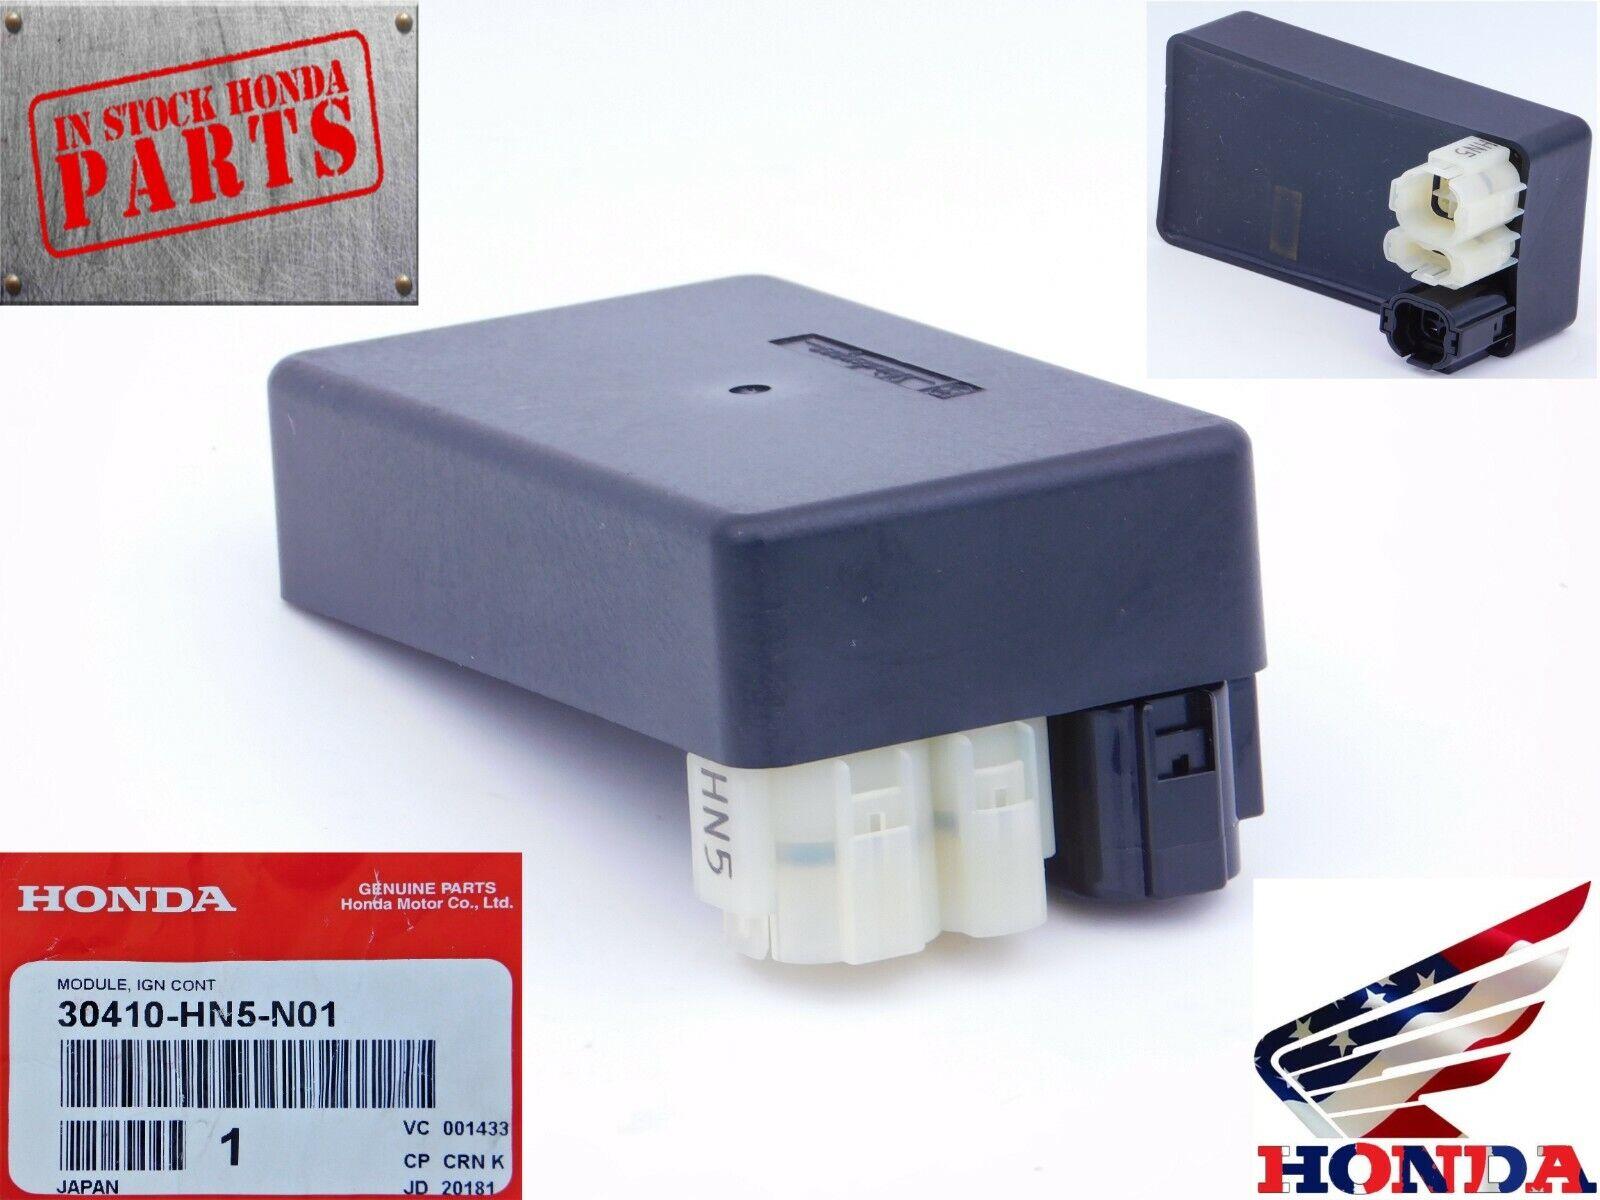 Unlimited Rider Ignition CDI Box 10 Pins DC For Honda TRX FE FM TE TM Rancher 350 2000-2005 Replace 30410-HN5-671 30400-HN5-305 30410-HN4-671 30400-HN4-305 30410-HN4-670 30410-HN5-670 30405-HN5-303